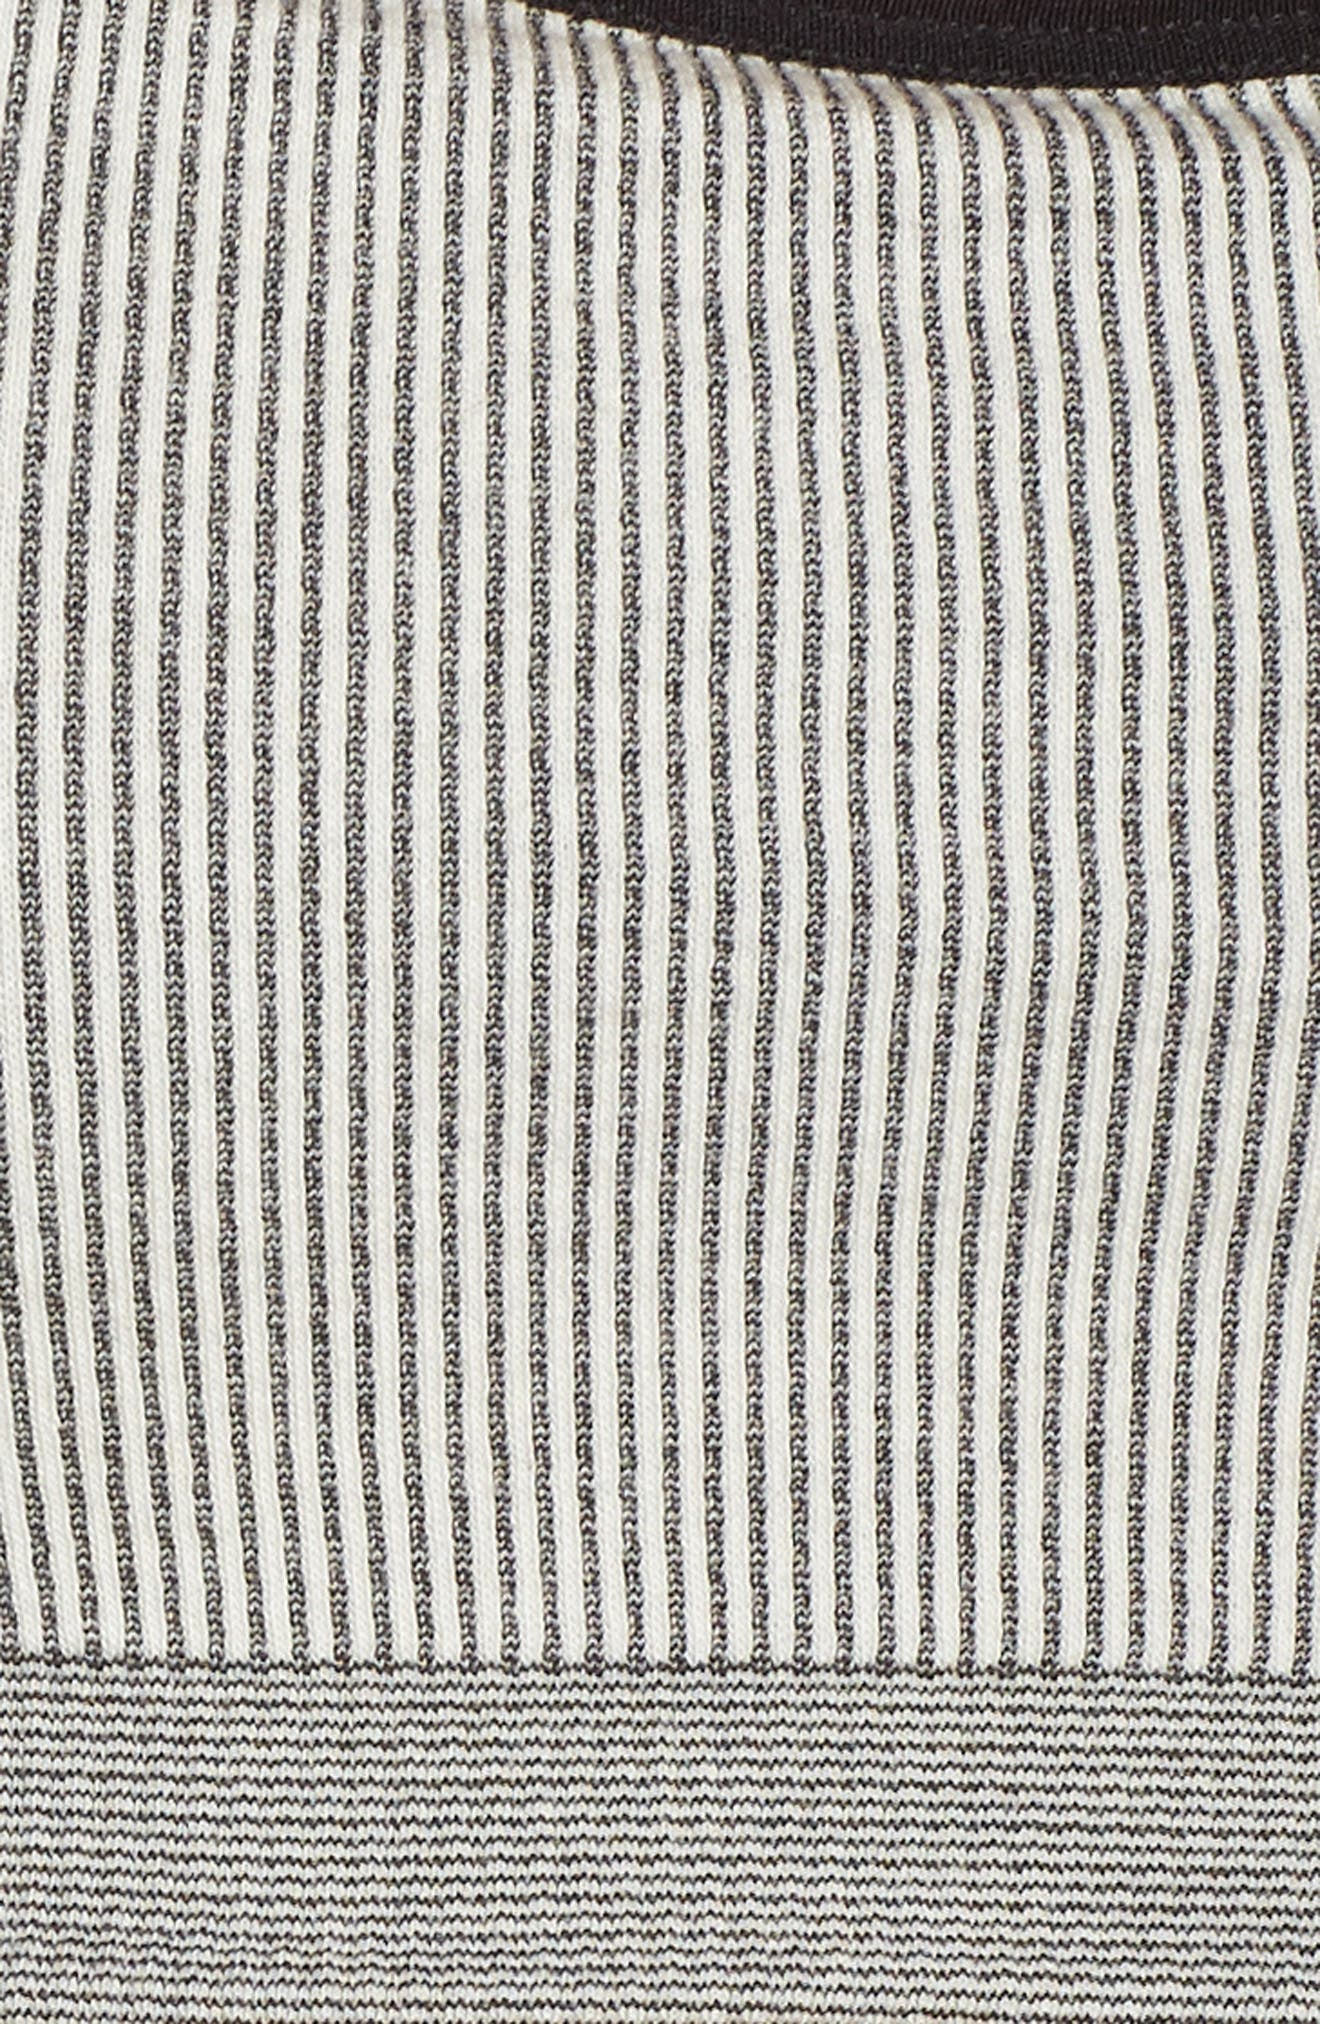 Loren Sports Bra,                             Alternate thumbnail 6, color,                             OFF WHITE/ BLACK